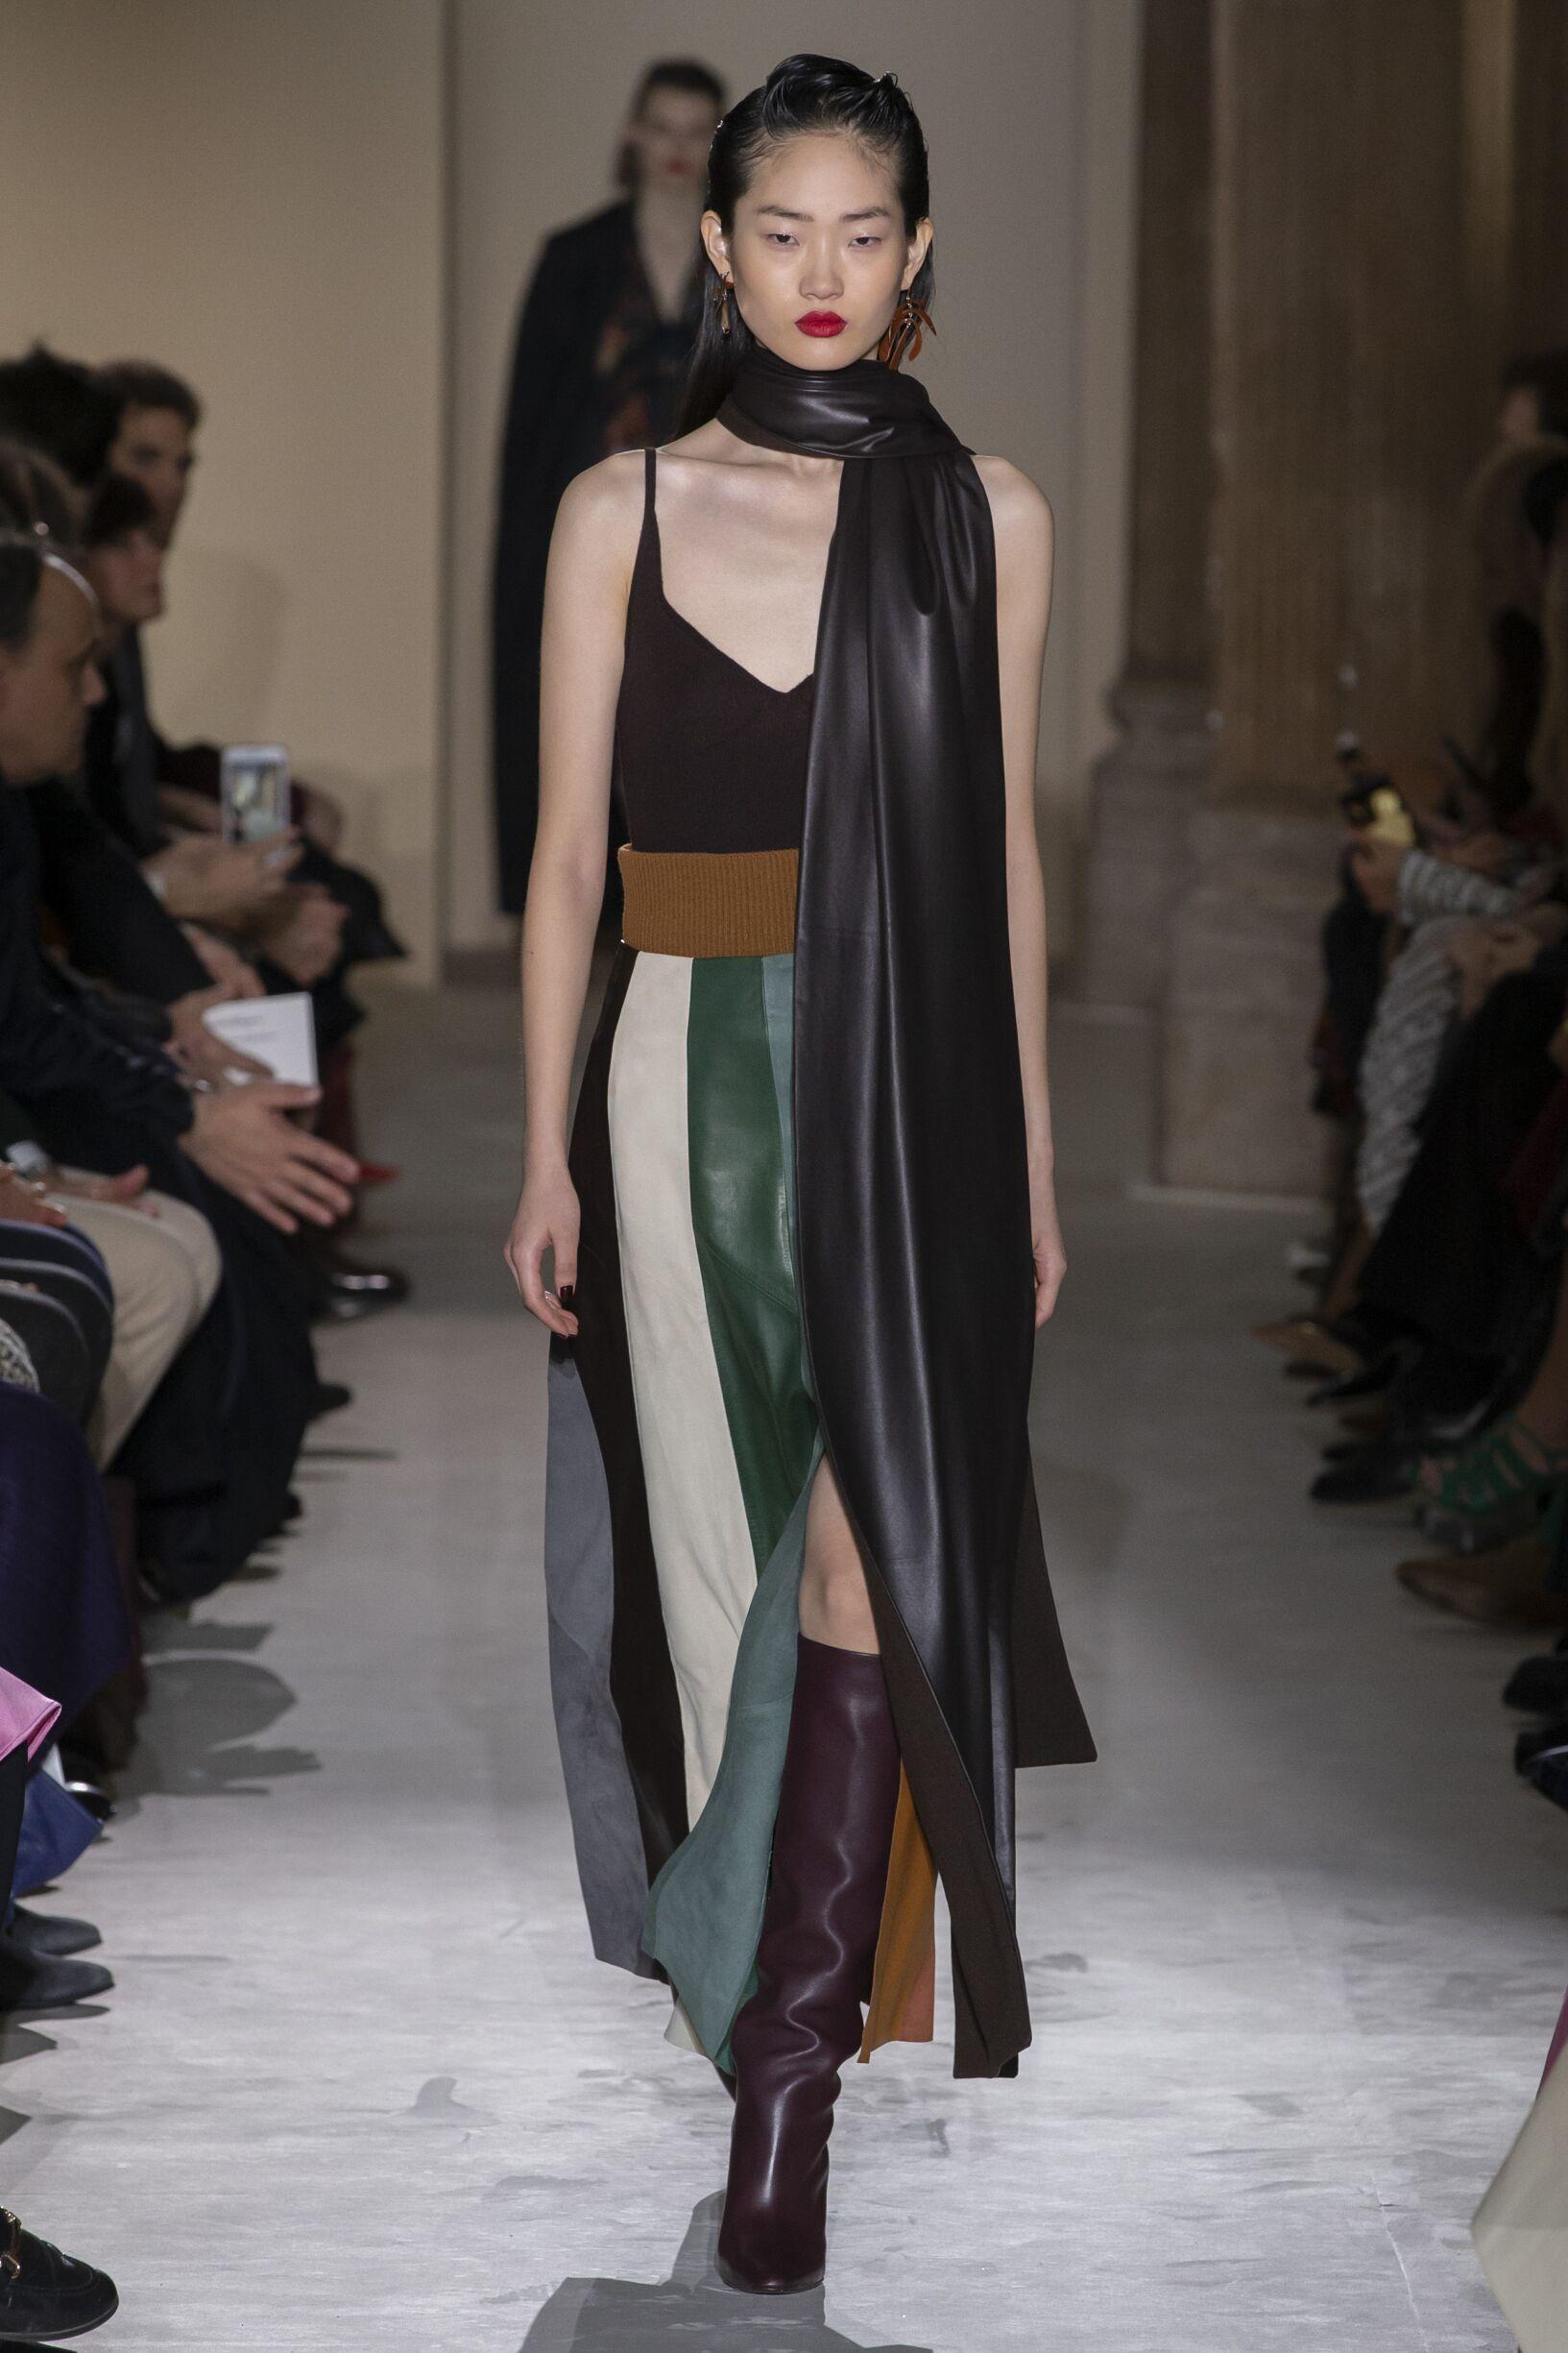 Salvatore Ferragamo Milan Fashion Week Womenswear 2019-20